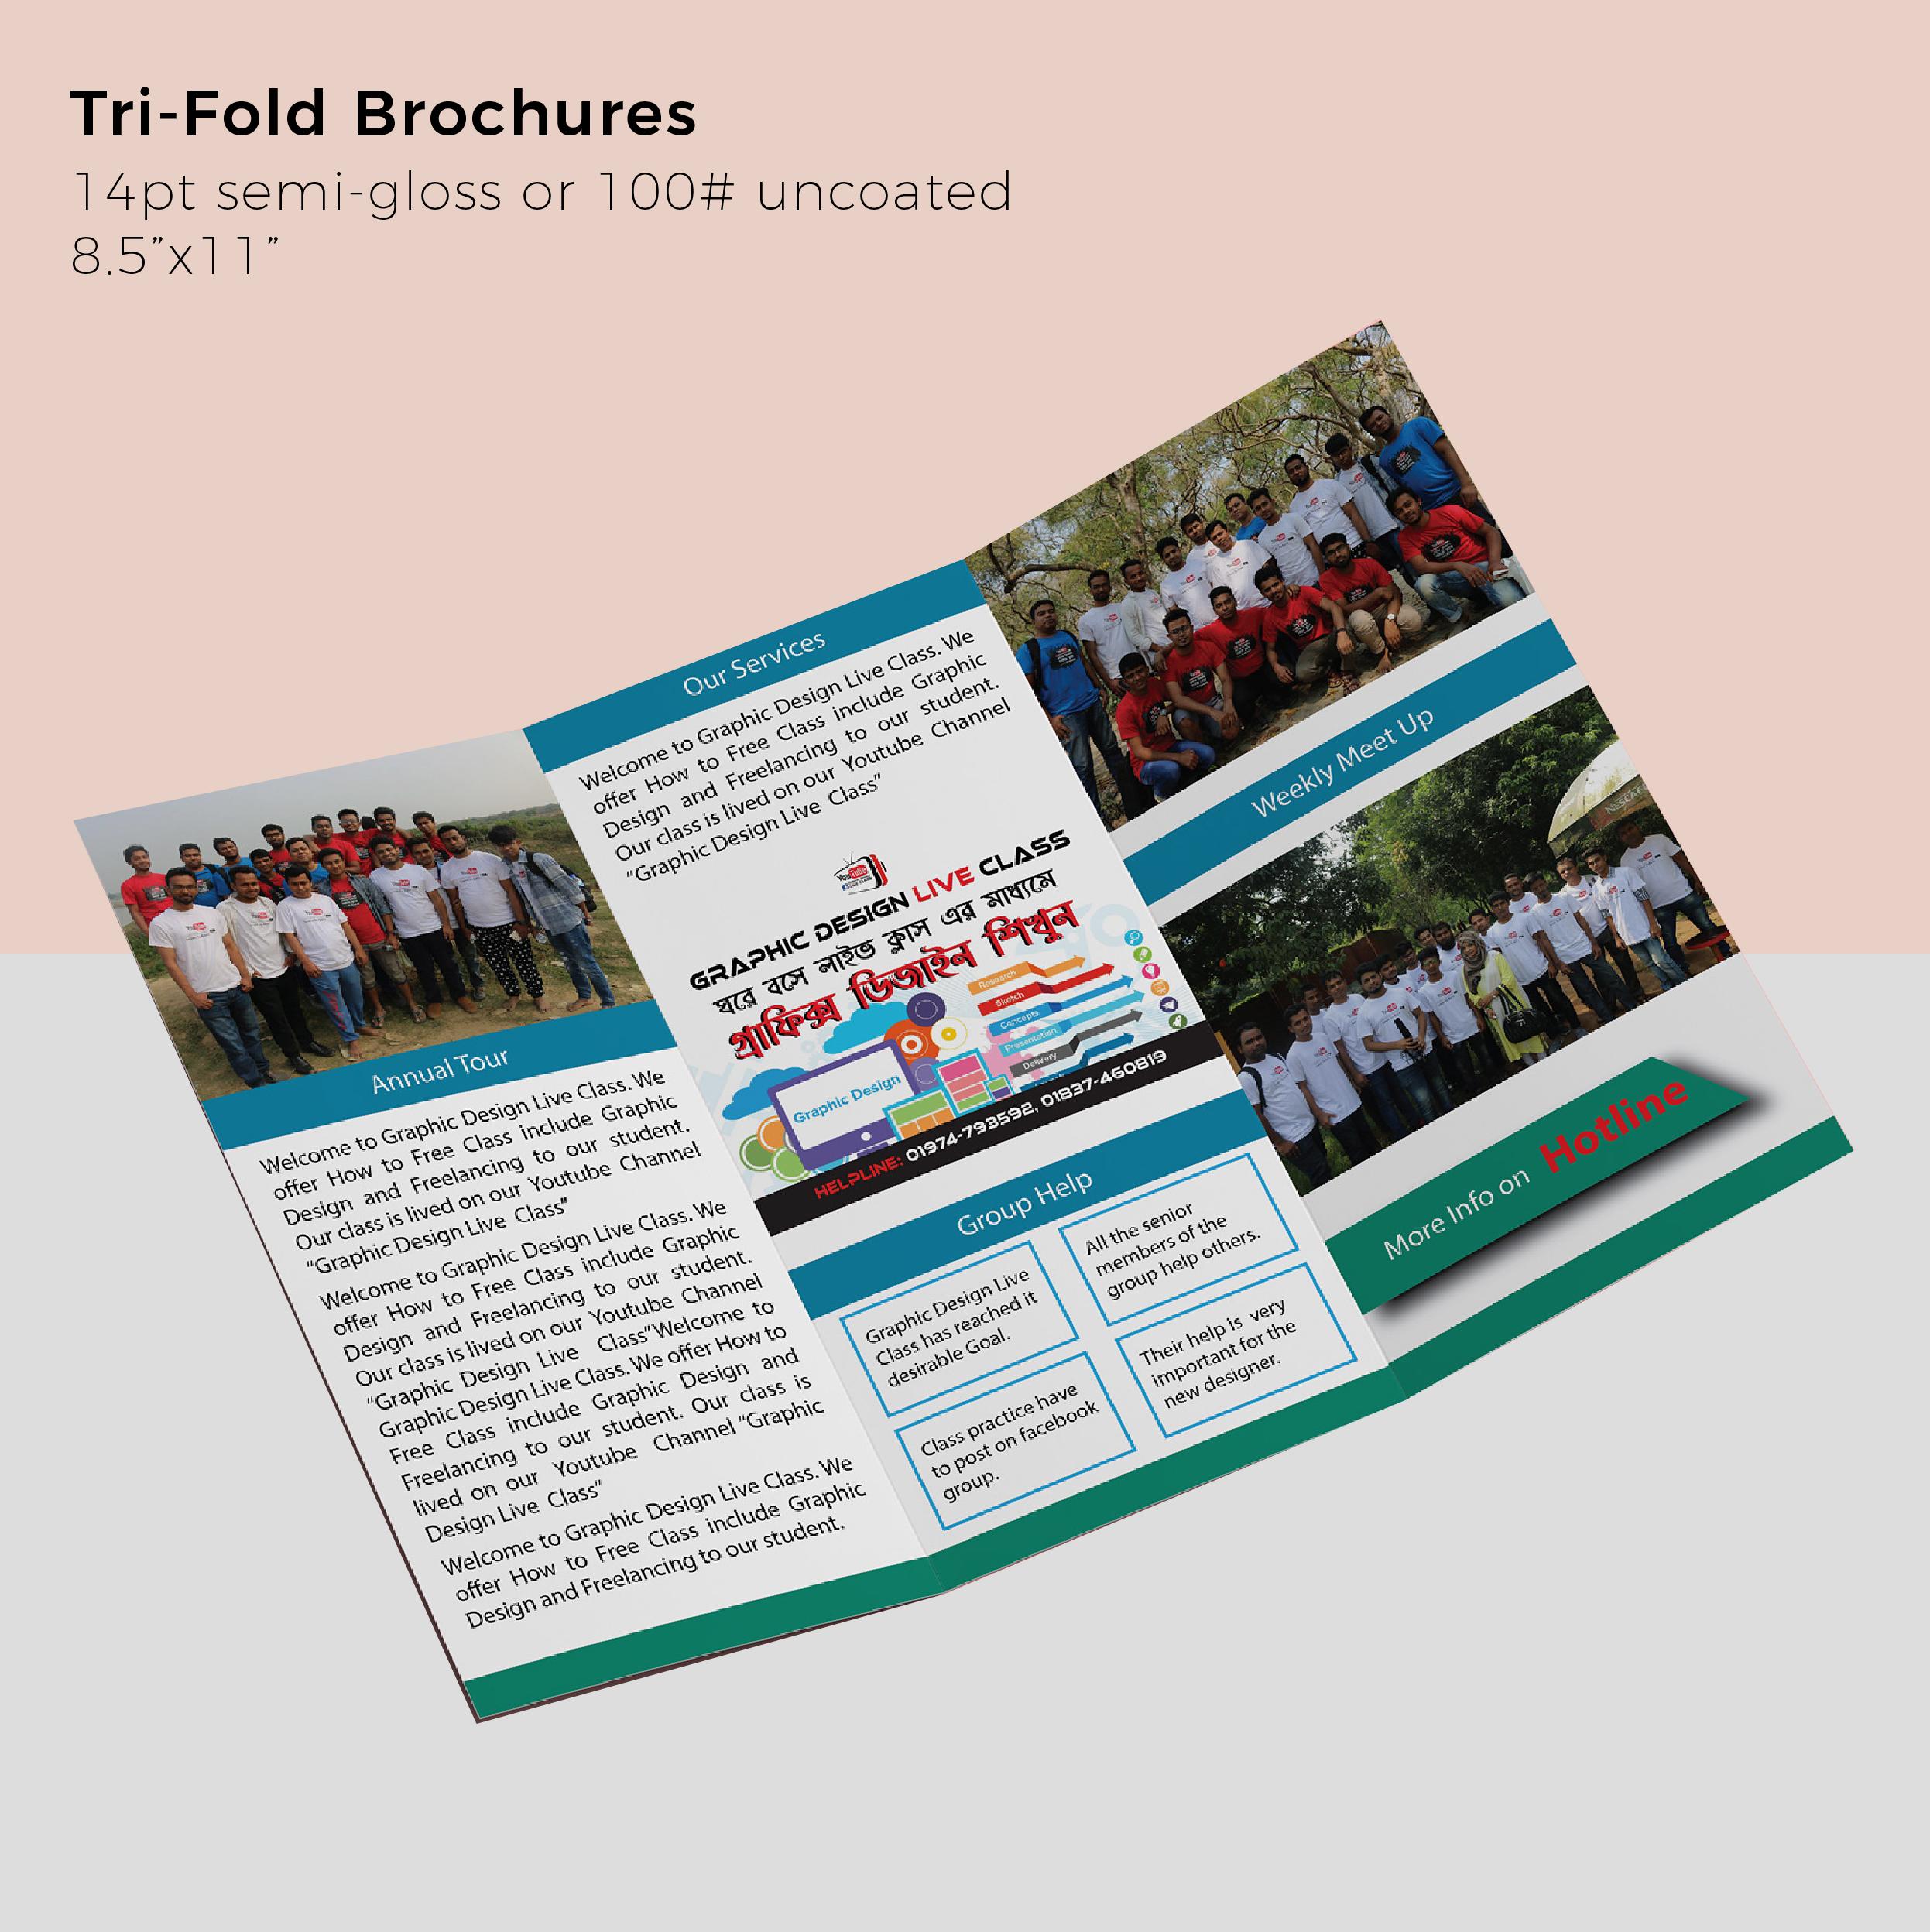 trifold_productdisplay.jpg